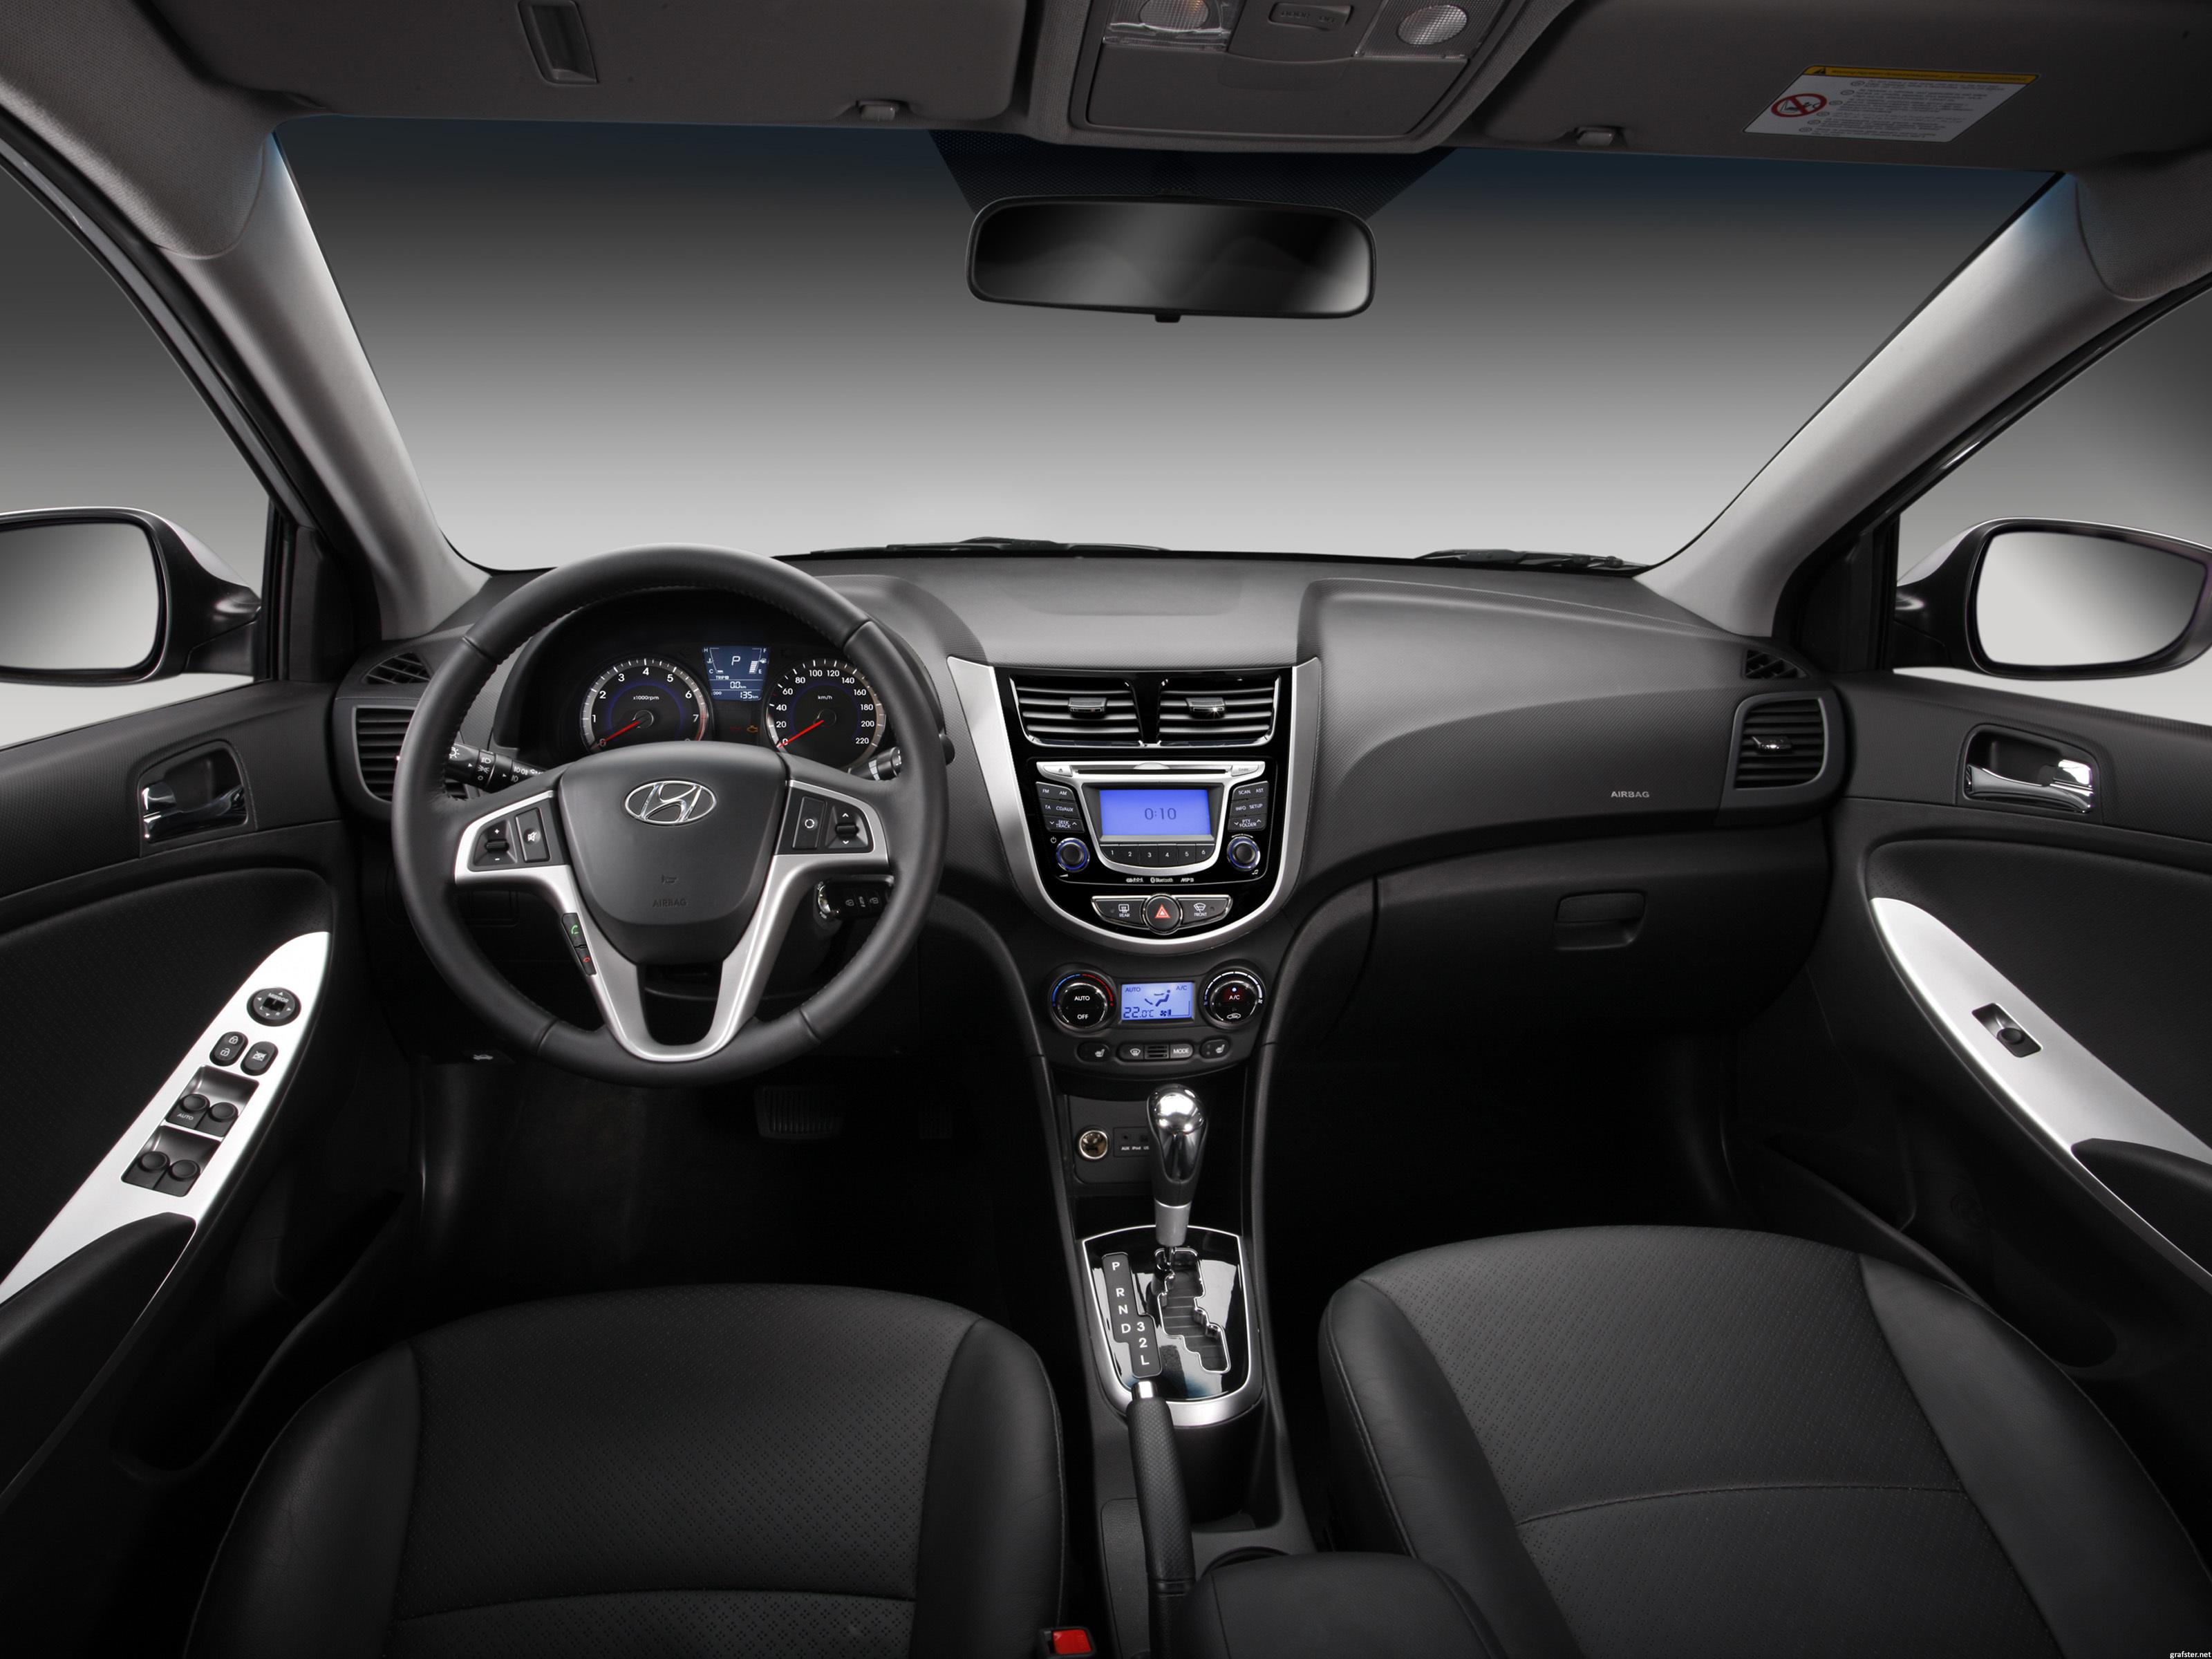 3dtuning Of Hyundai Solaris Sedan 2011 3dtuning Com